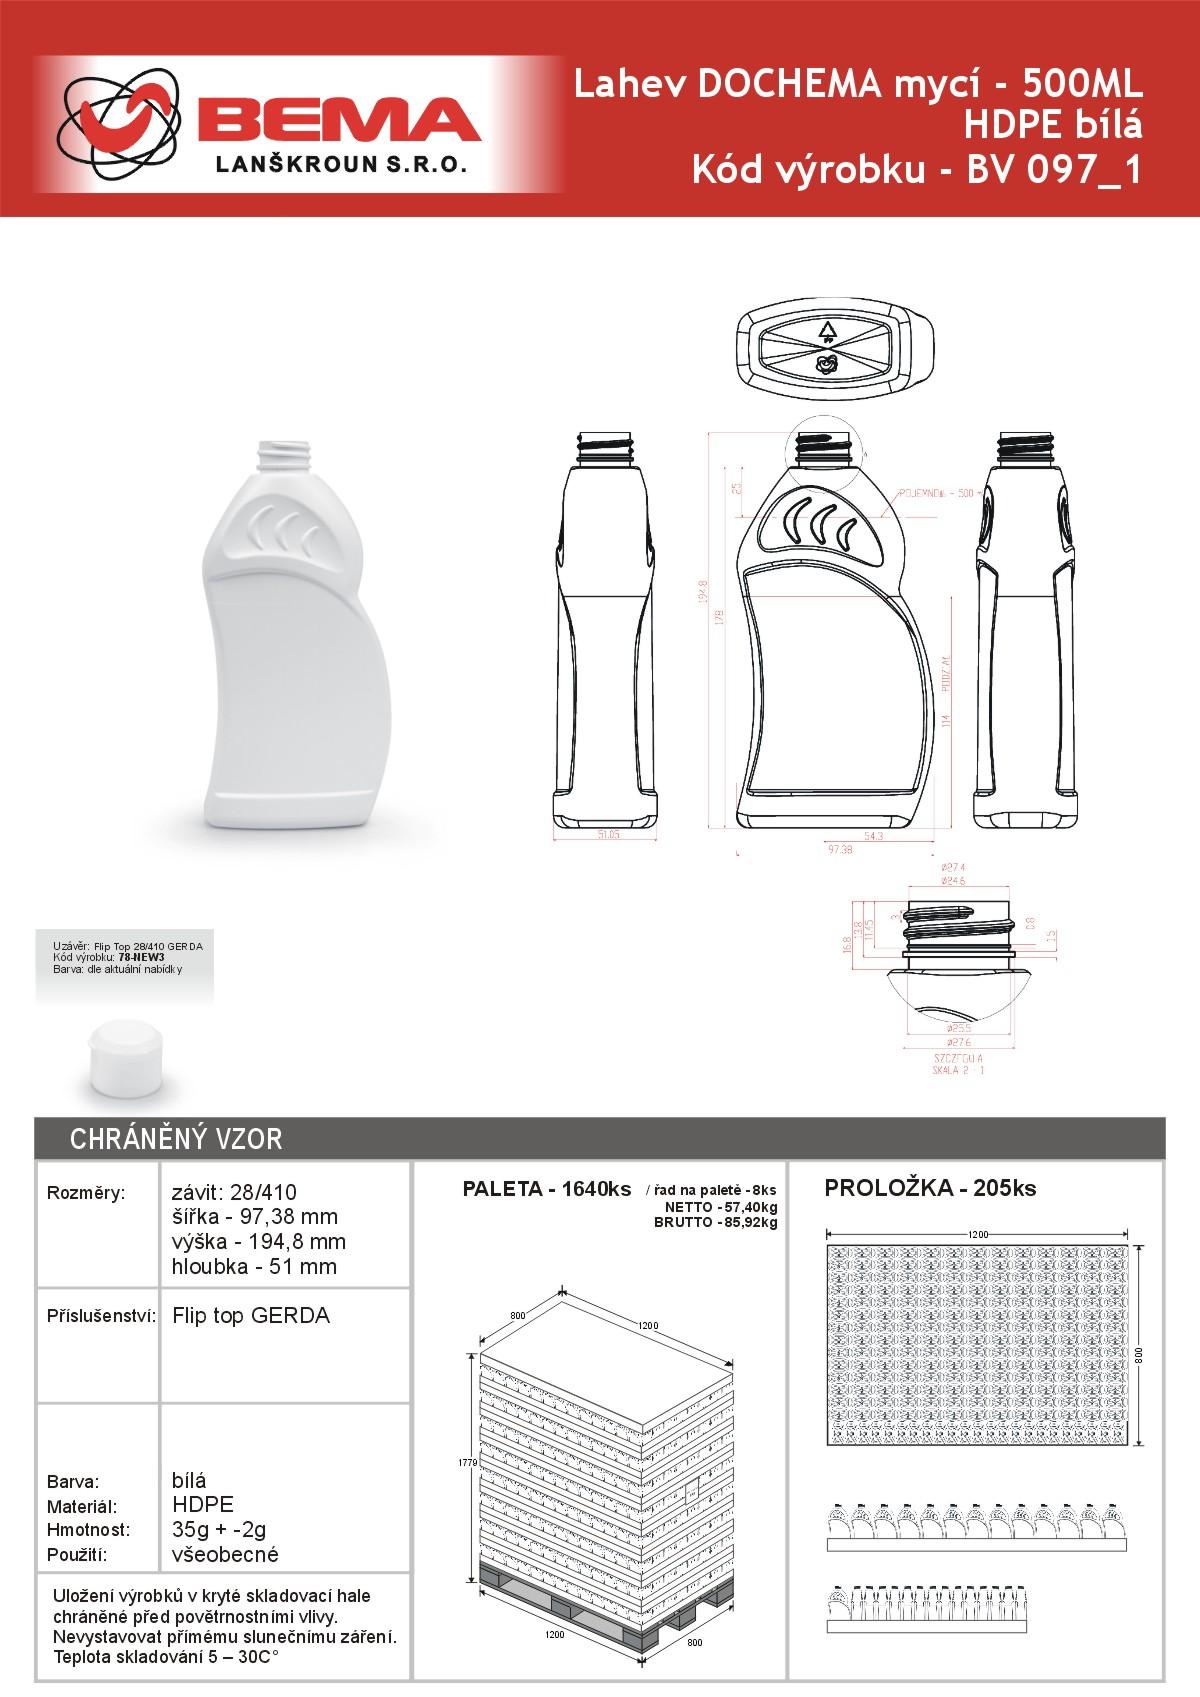 Dochema-lahev500ml-2-2-21